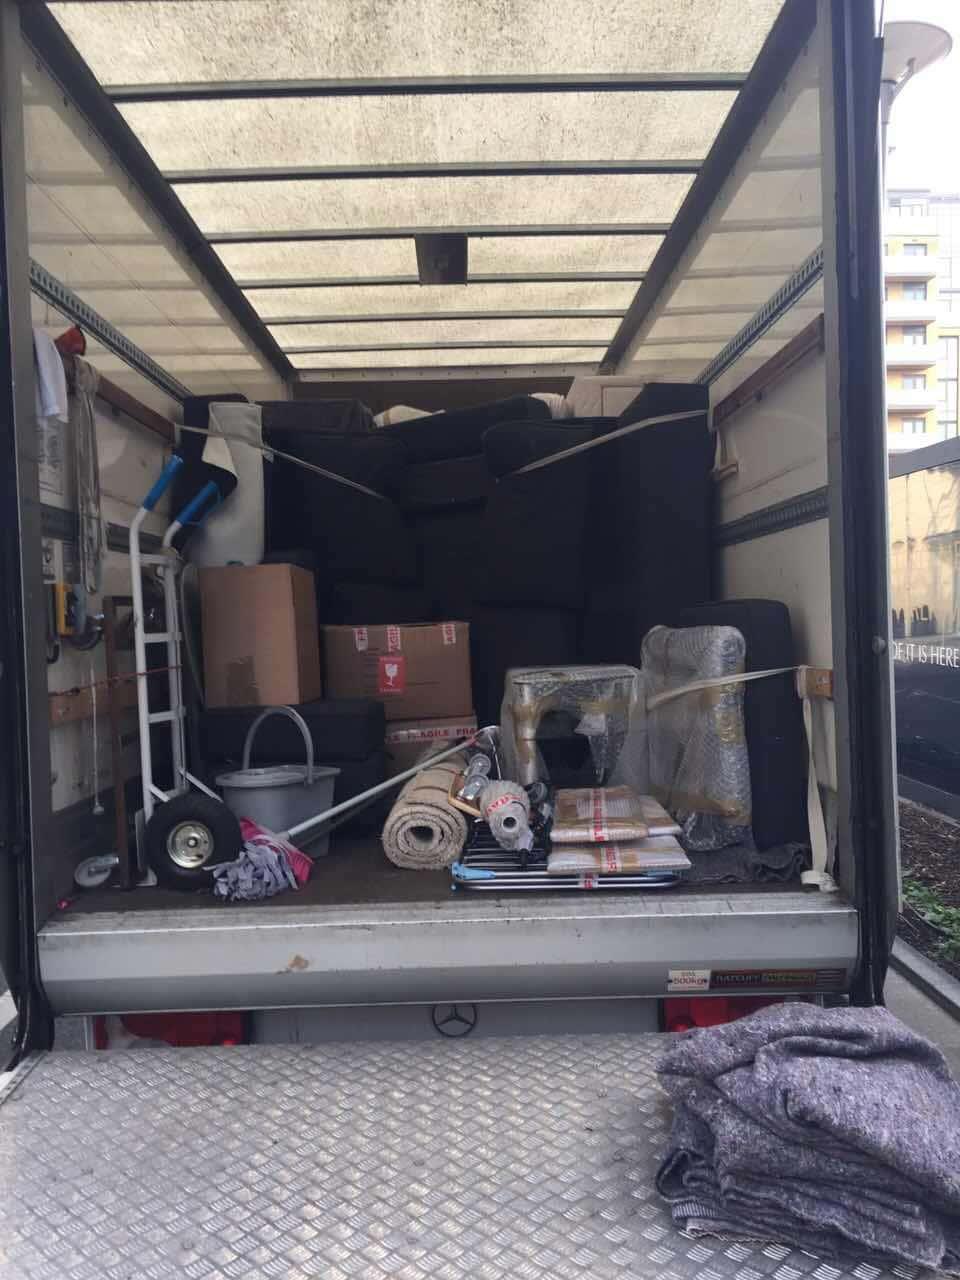 New Eltham moving vans SE9